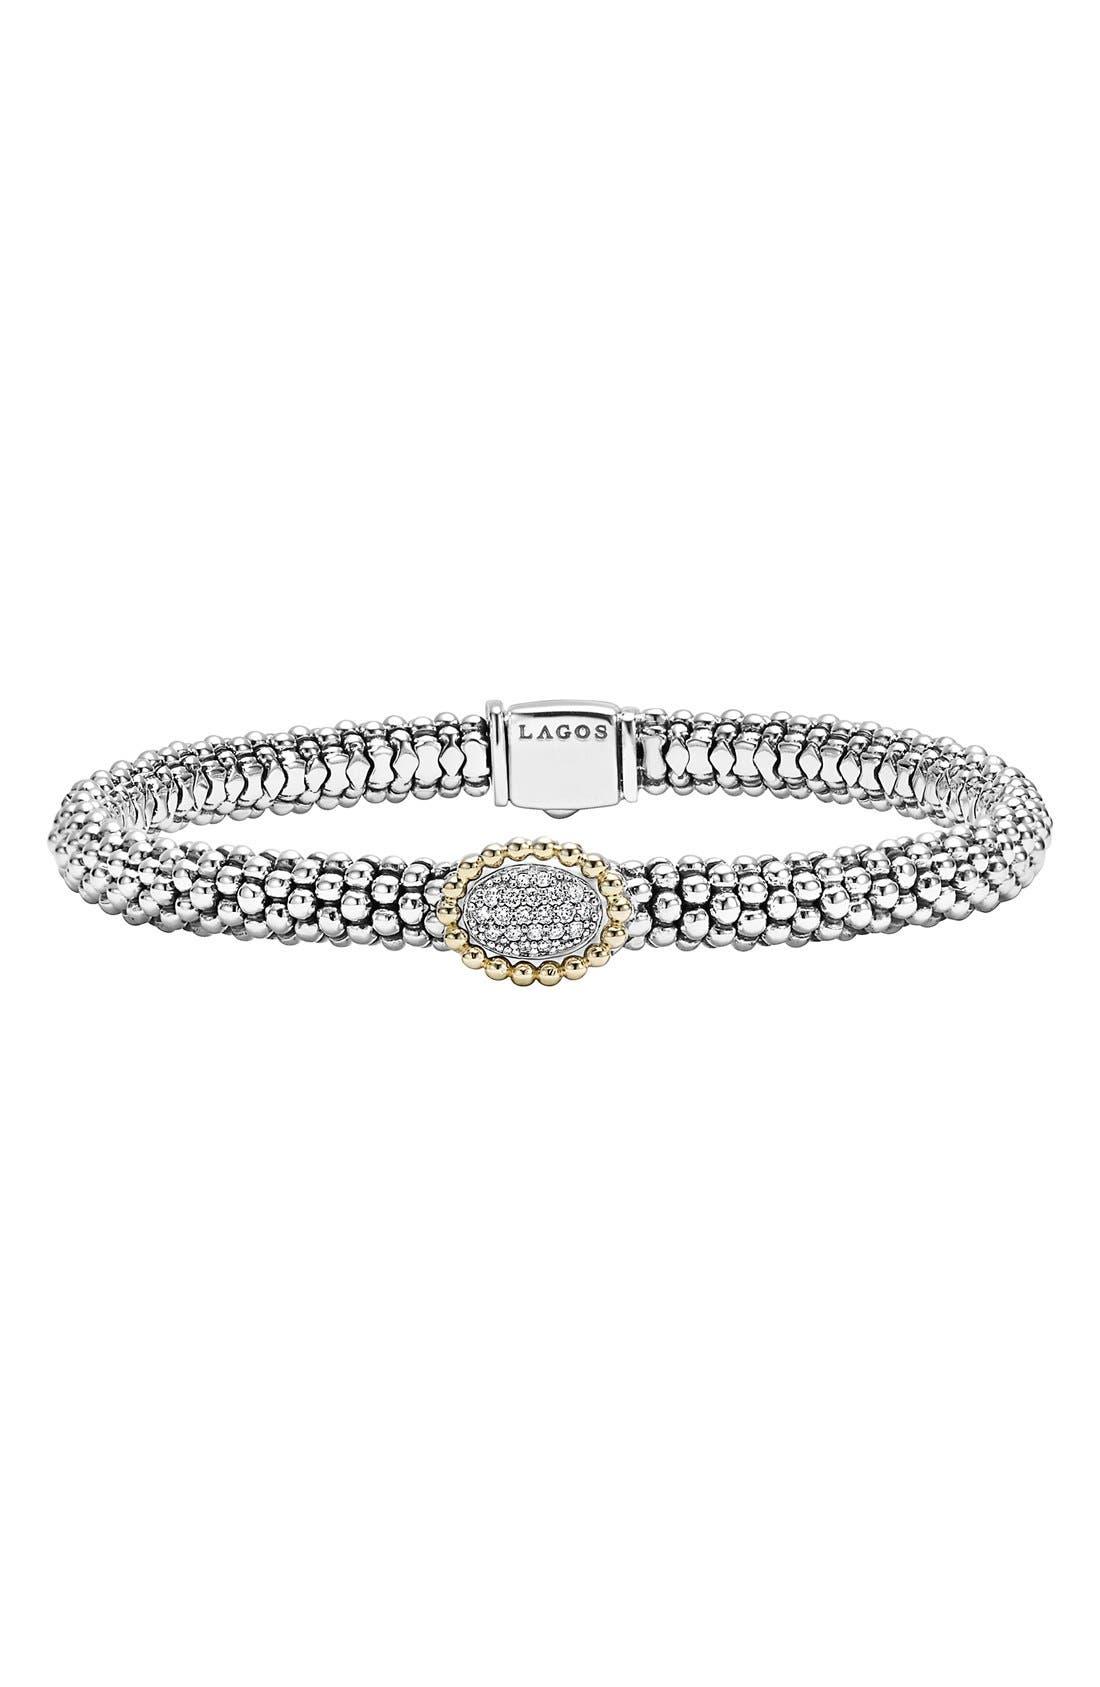 Diamond Caviar Oval Bracelet,                             Main thumbnail 1, color,                             040